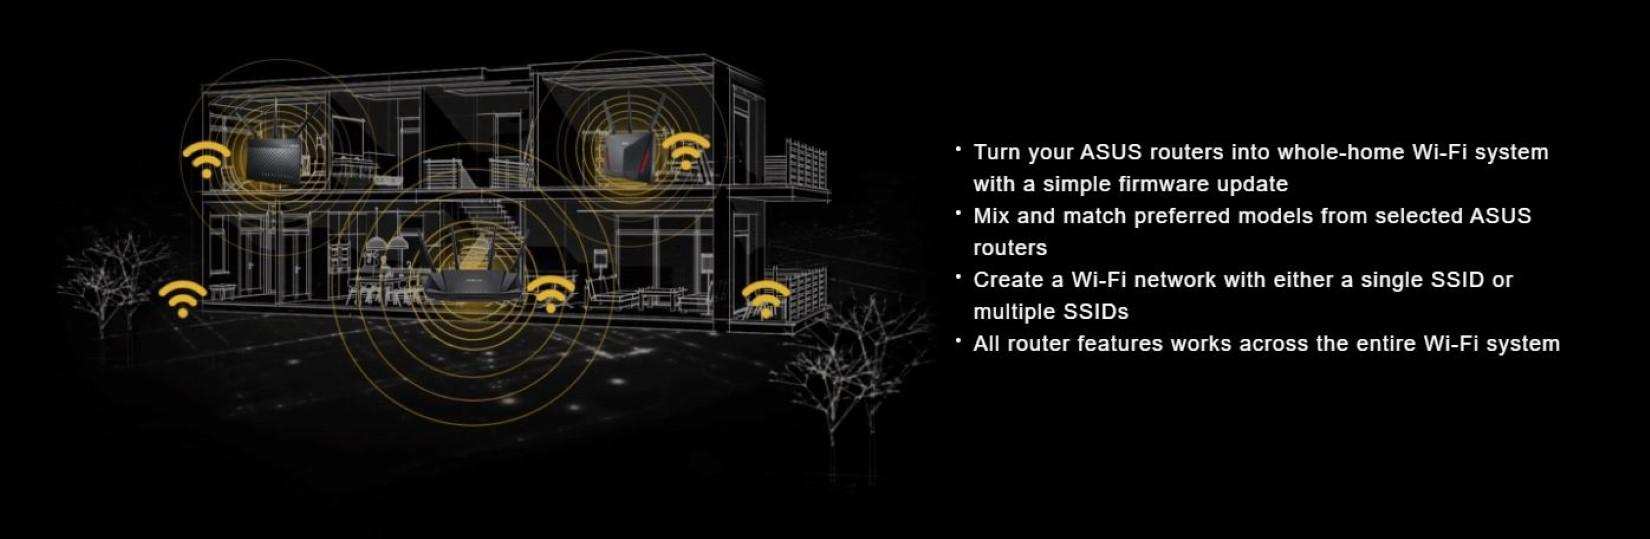 Router wifi ASUS RT-AX56U - AX1800 2 băng tần, Wifi 6 (802.11ax), AiMesh 360 WIFI Mesh, AiProtection, USB 3.1 6